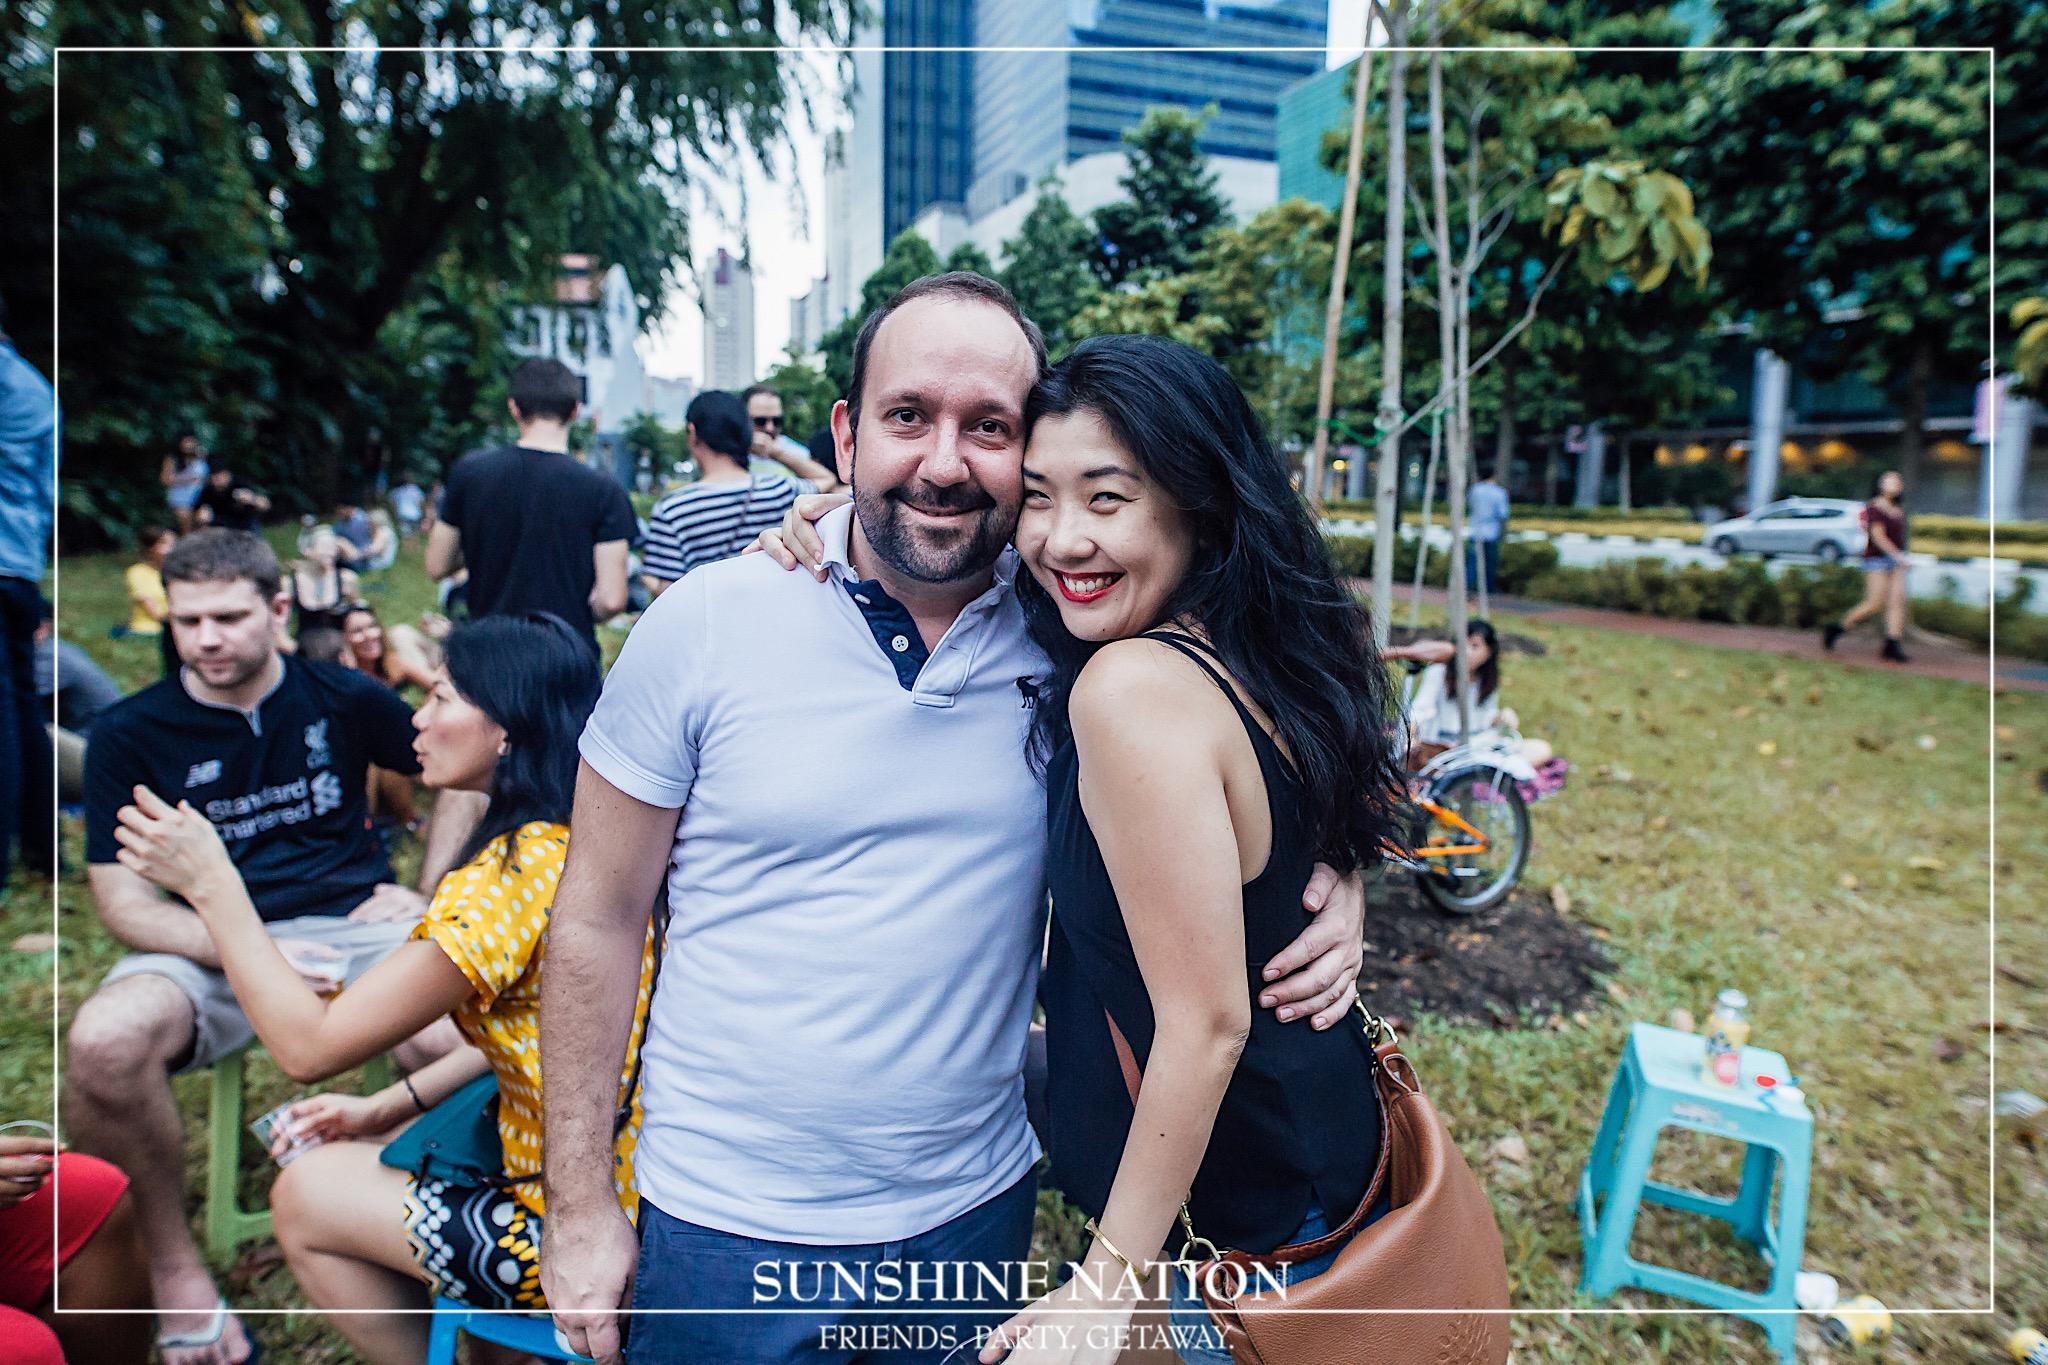 20112016_SunshineNation_Colossal115_Watermarked.jpg